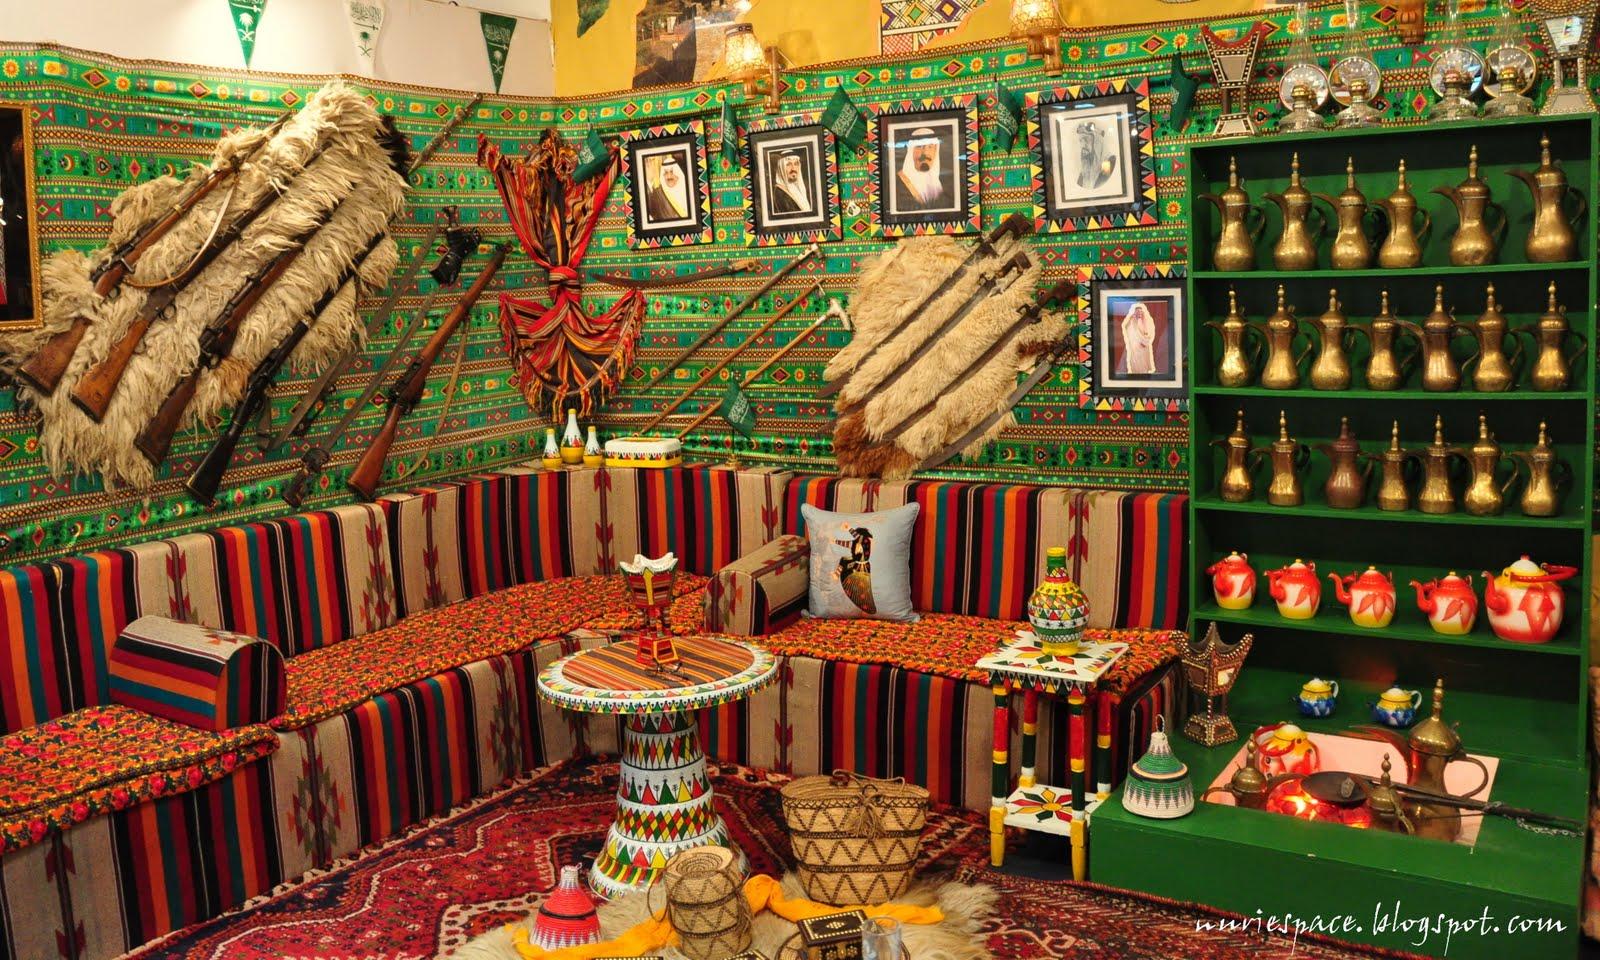 the culture and tradition in saudi arabia